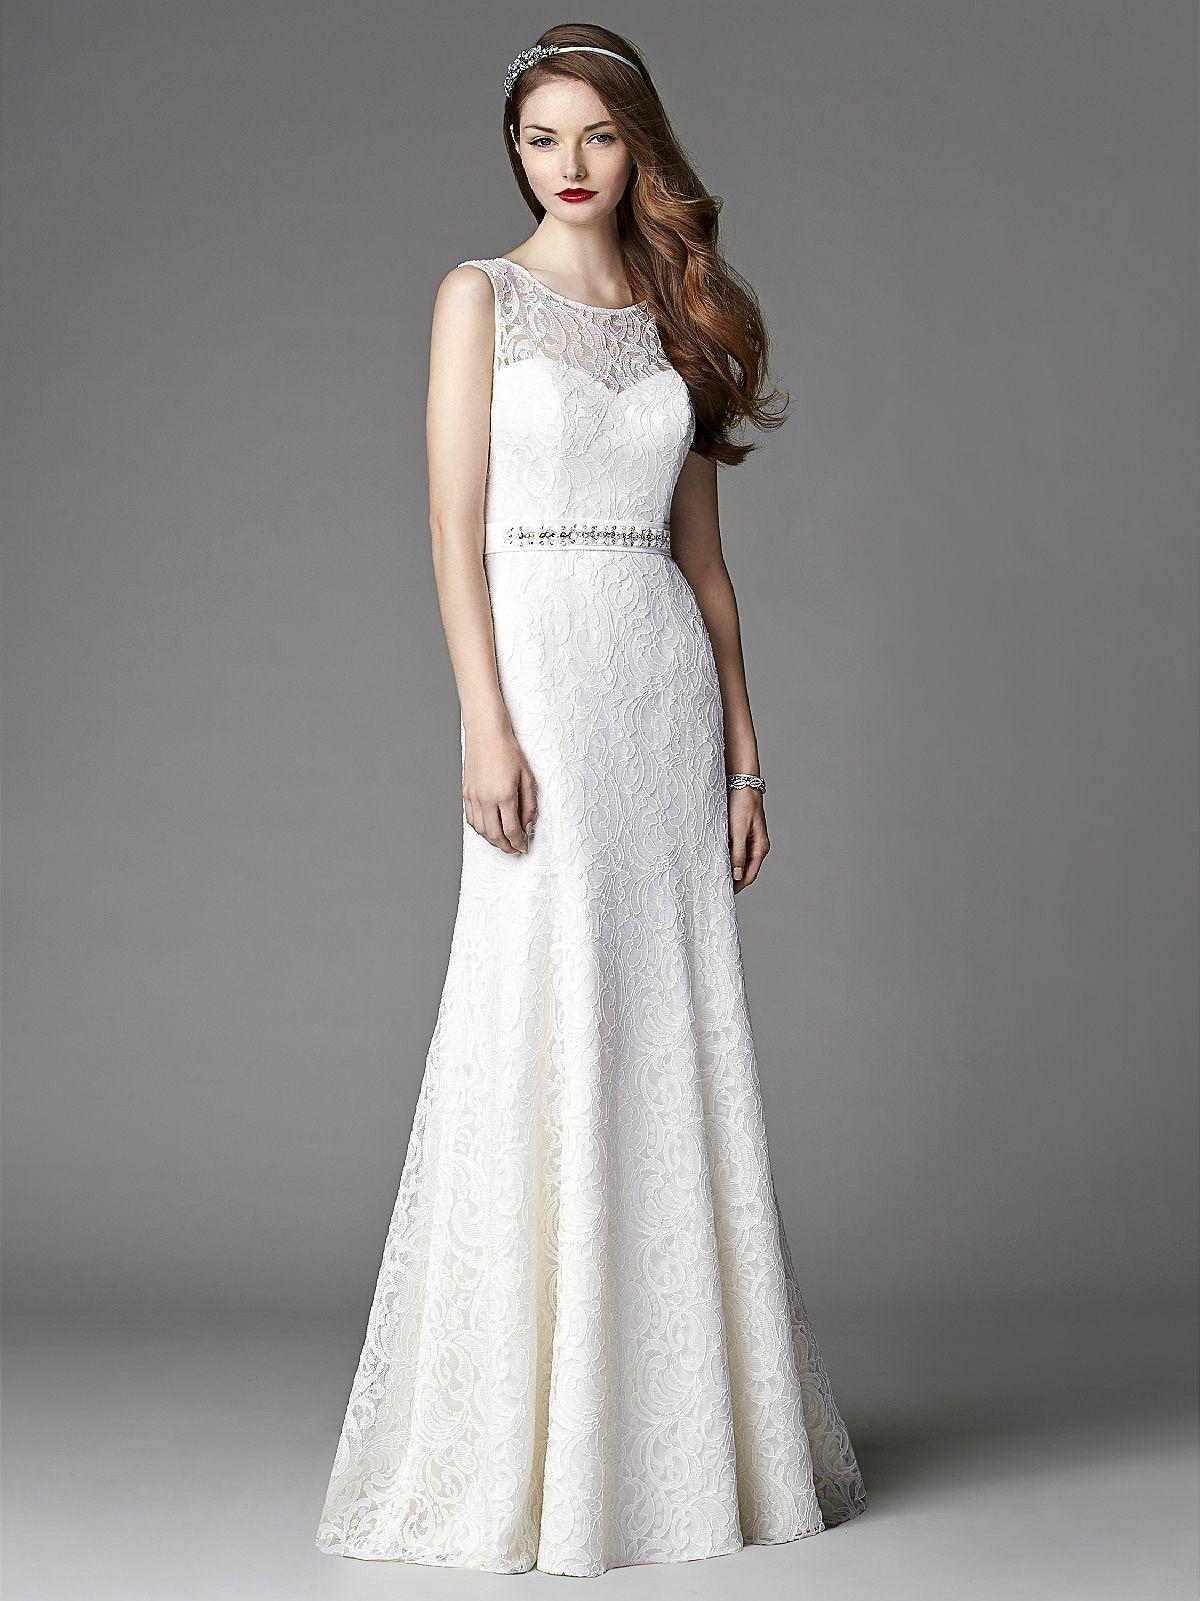 After six wedding dress 1048 httpdessydresseswedding after six wedding dress 1048 httpdessydresses ombrellifo Choice Image